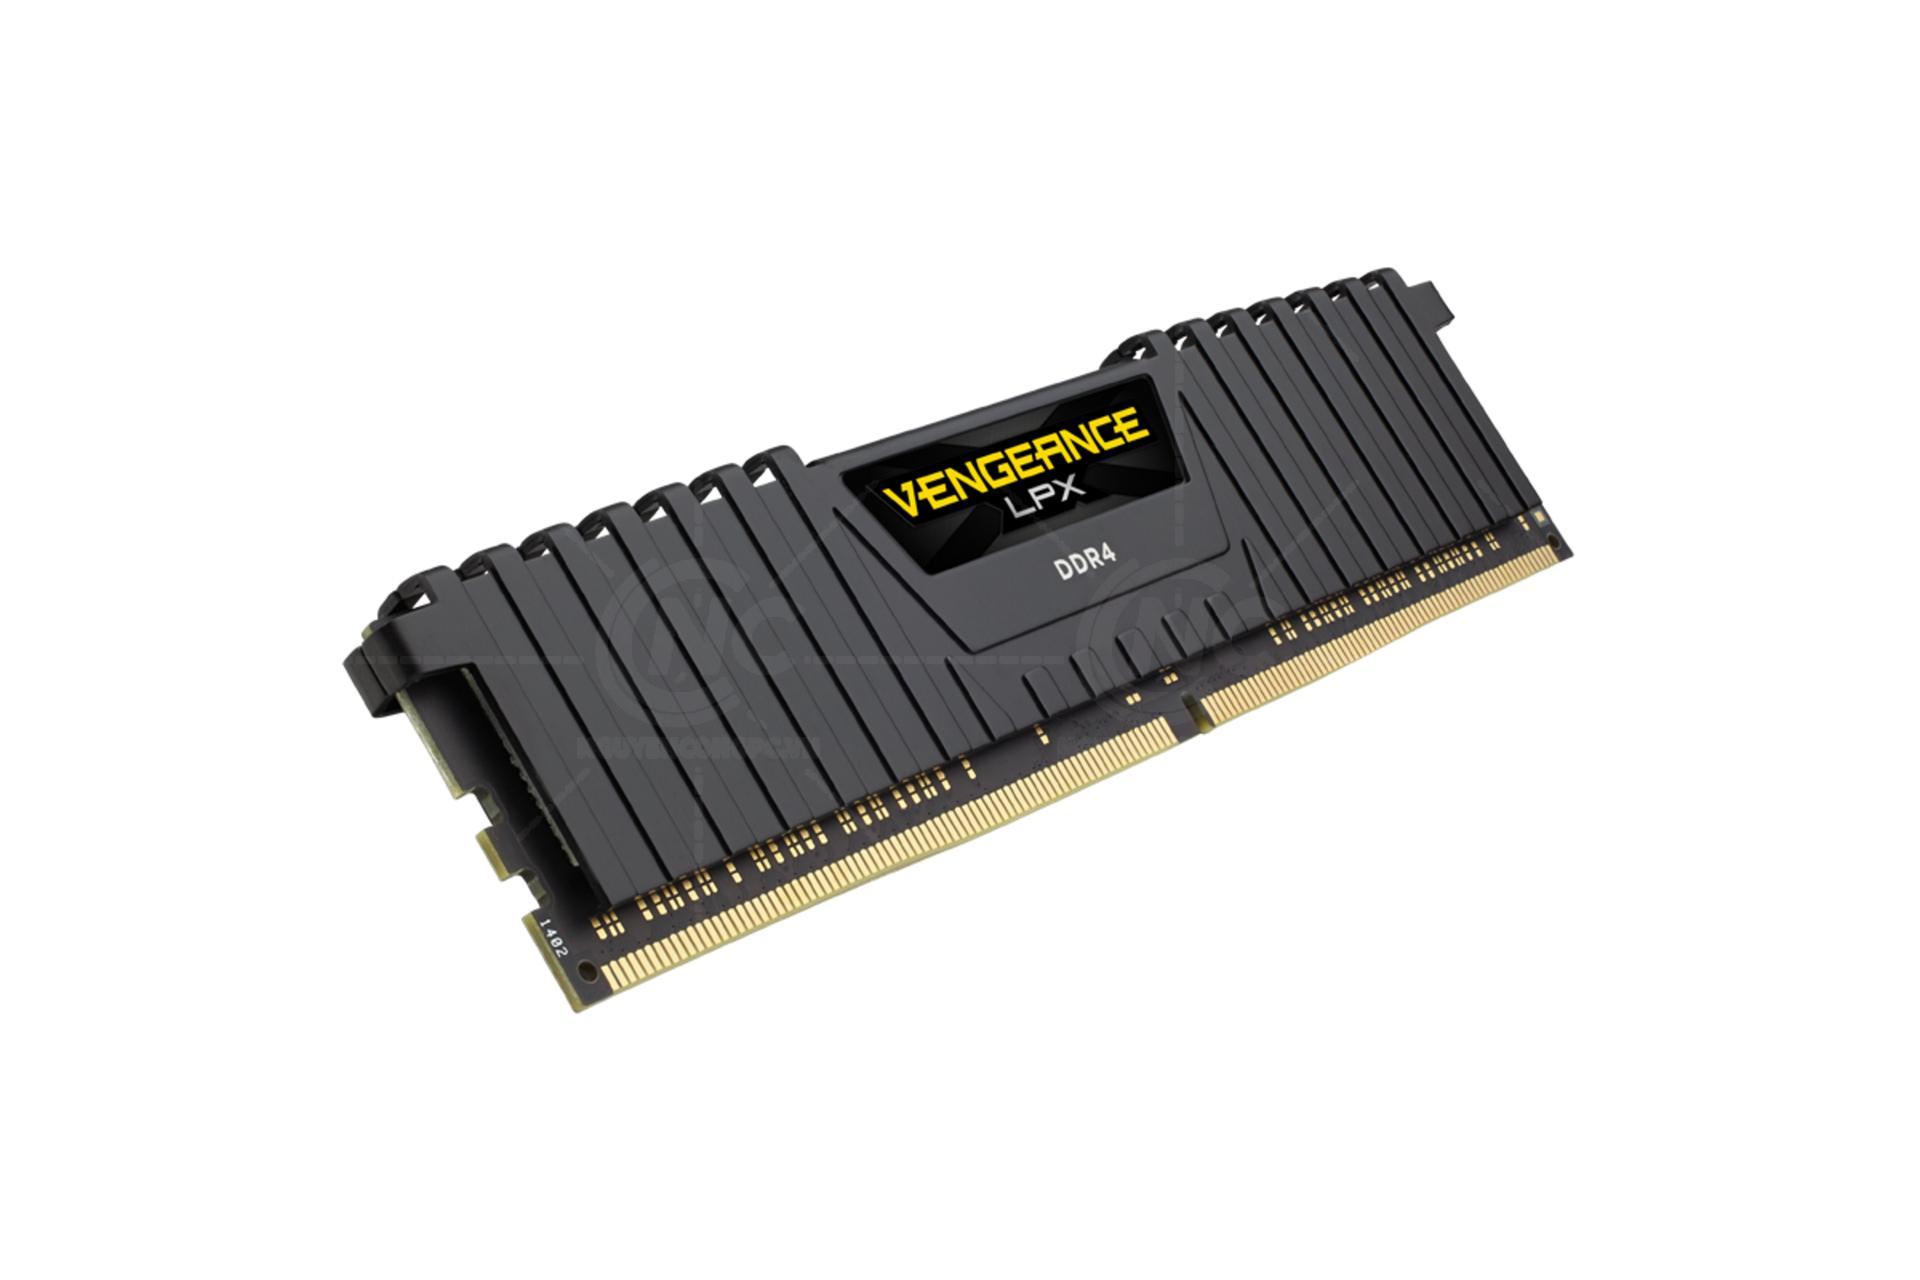 RAM LPX VENGEANCE